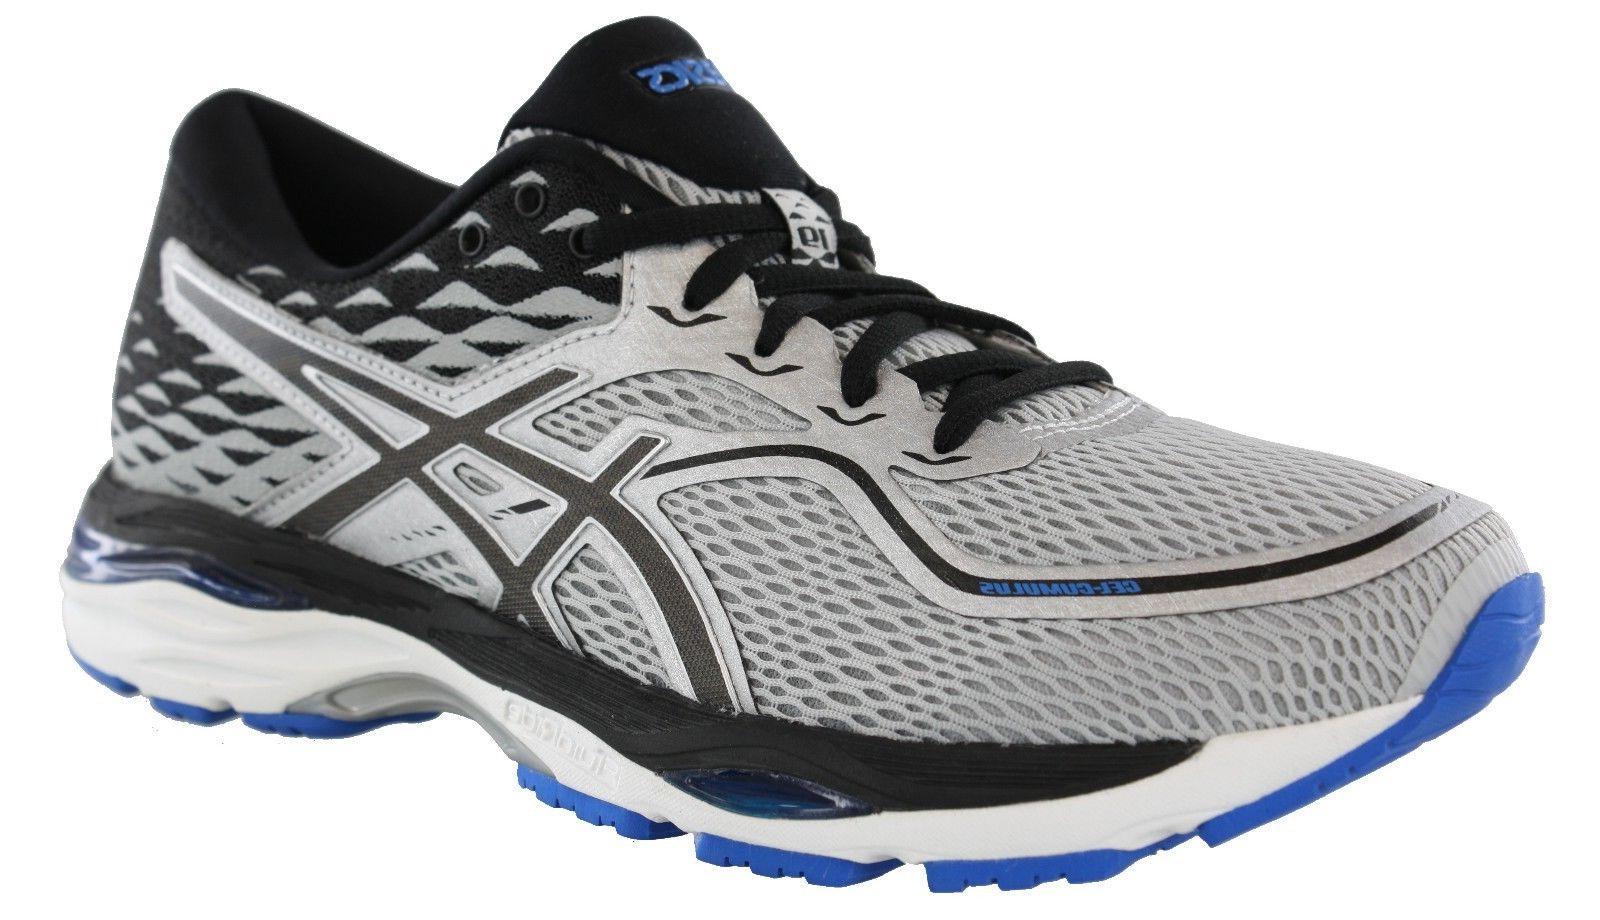 asics gel-cumulus 19 women's running shoes instructions